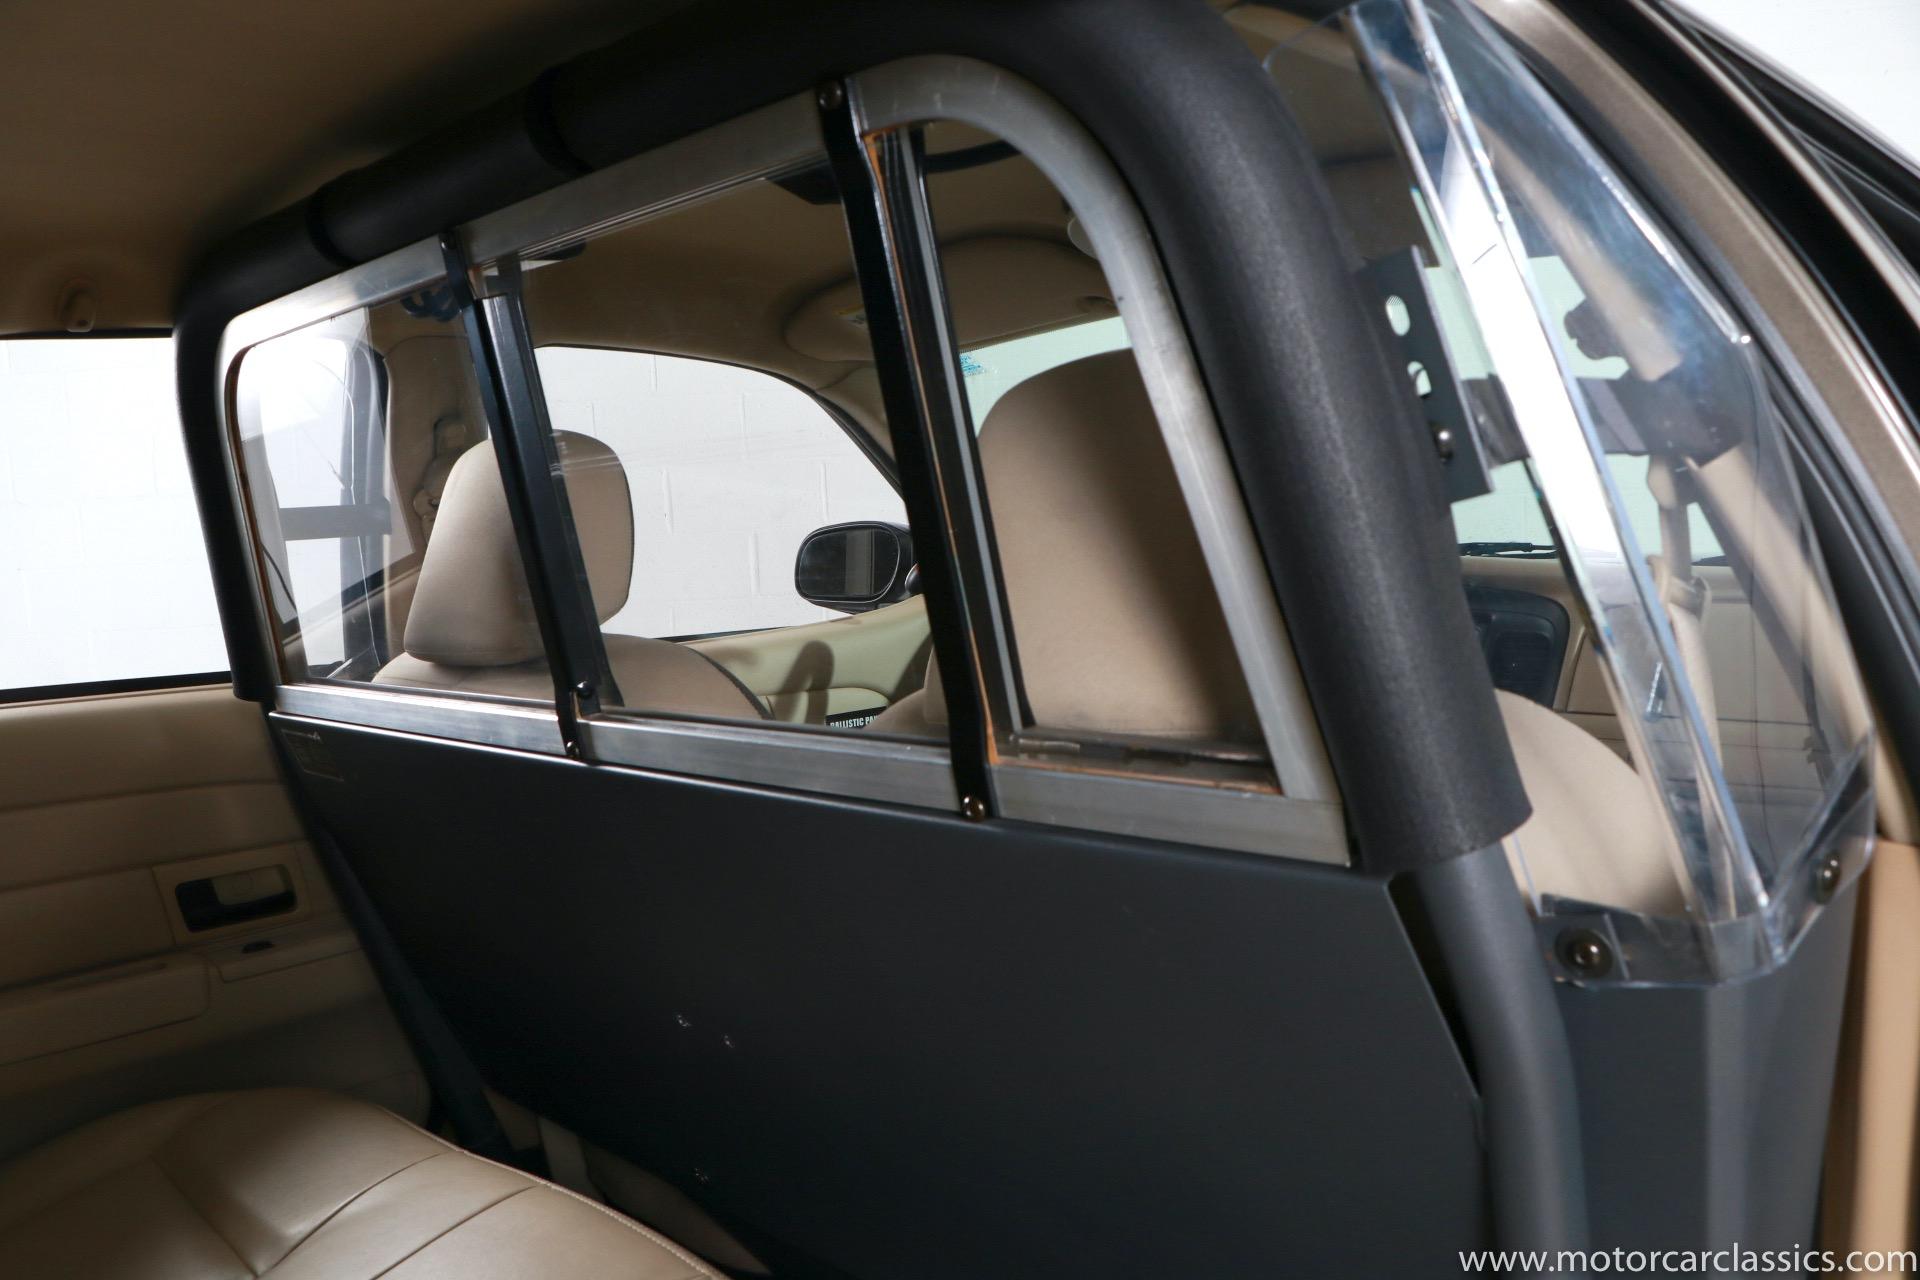 2007 Ford Crown Victoria Police Interceptor